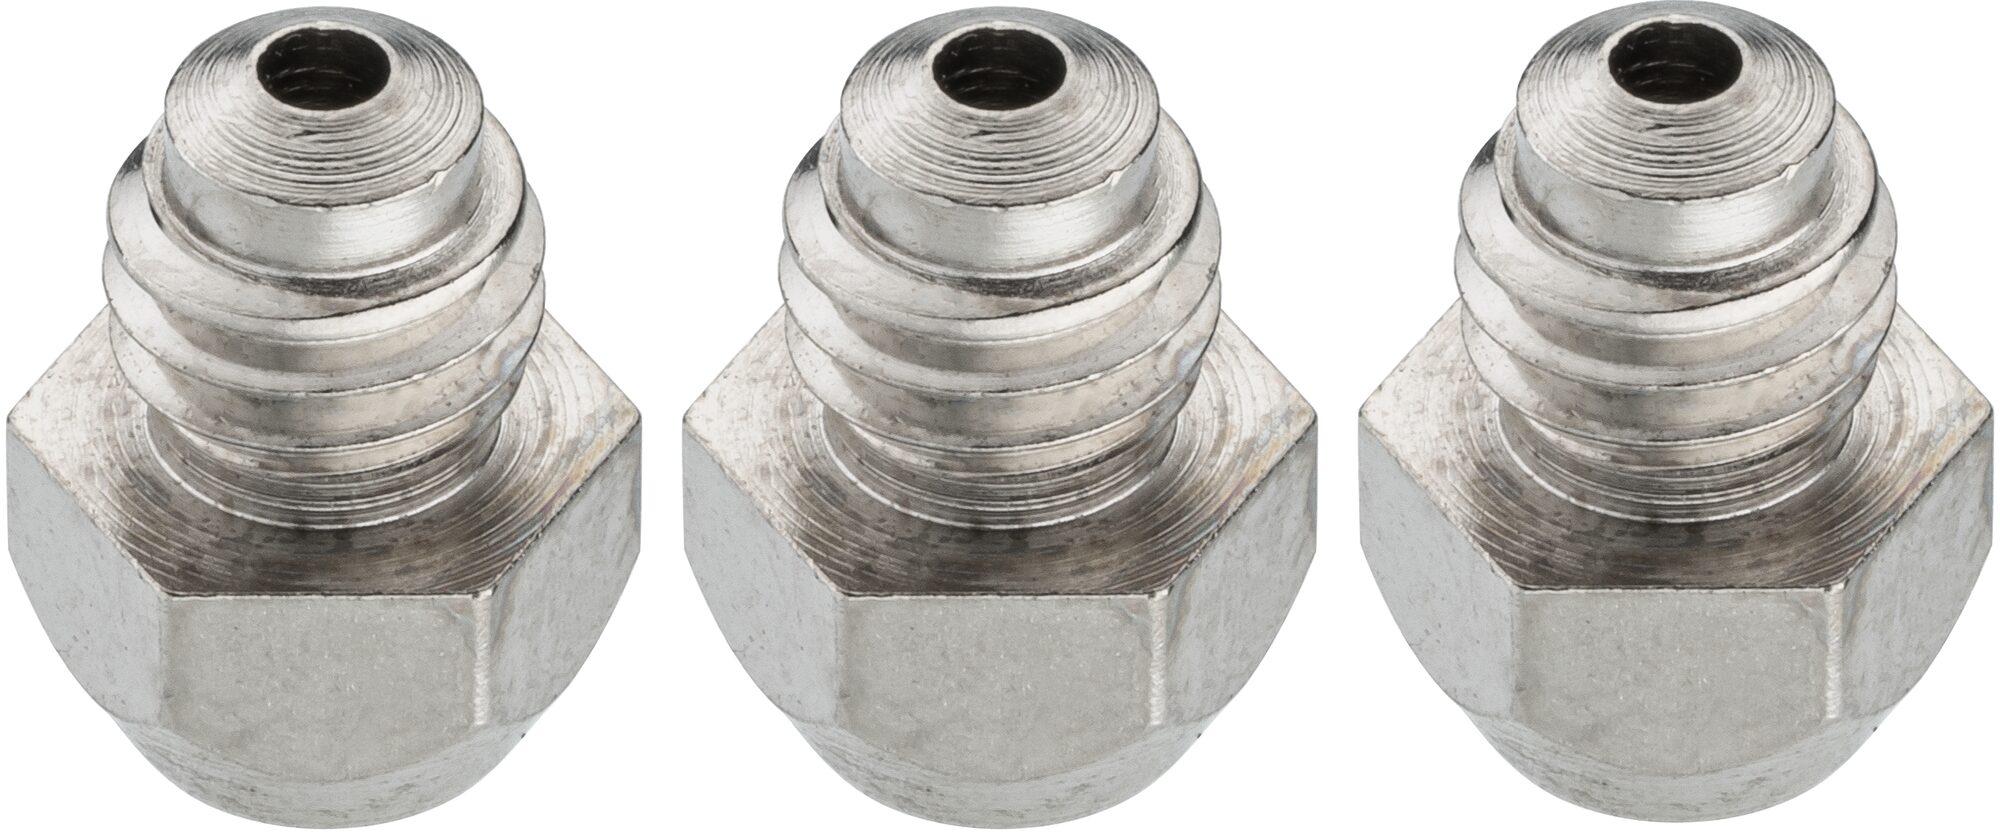 HAZET Mundstück ∙ 3,2mm (1⁄8″) 9037SPC-016/3